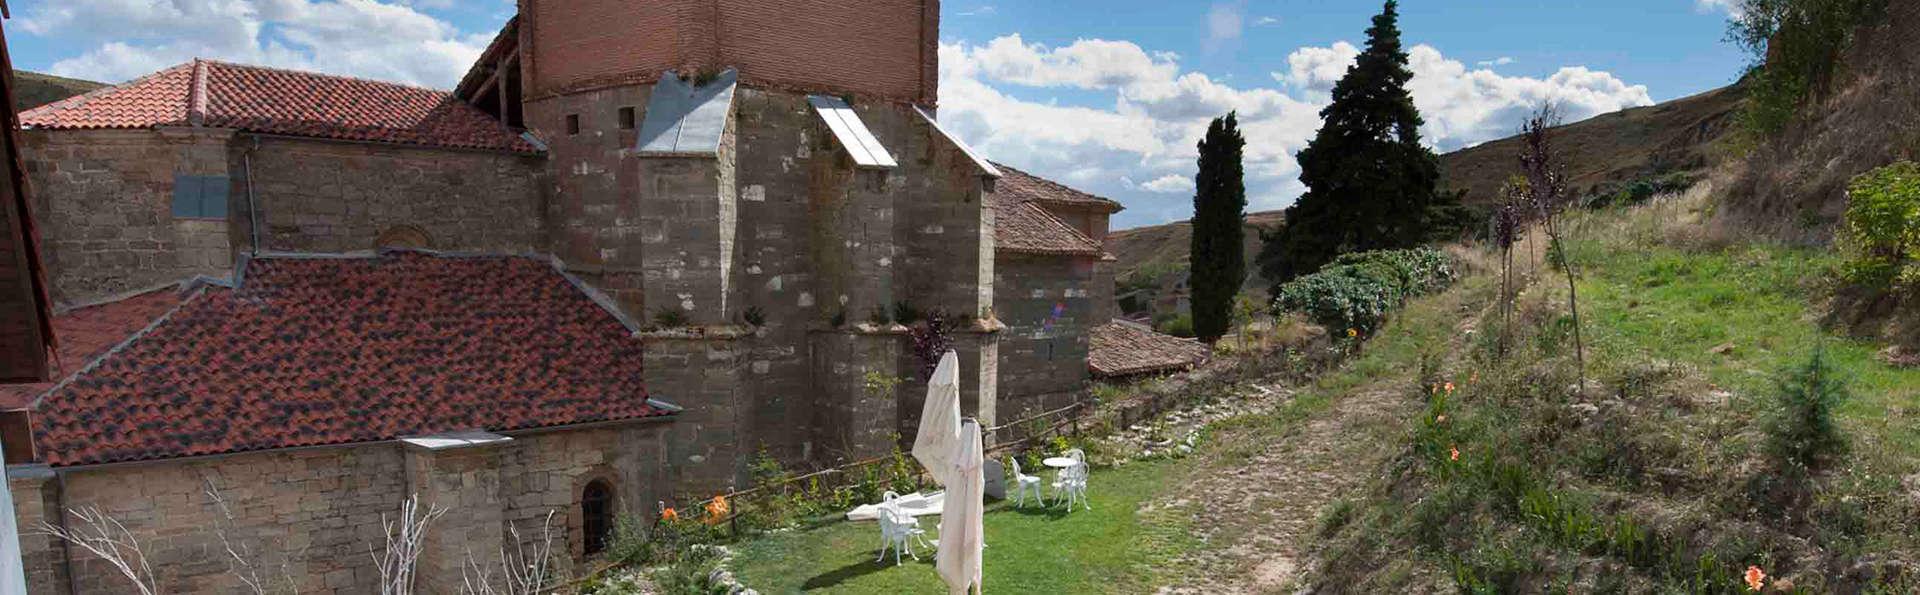 El Palacete del Obispo - EDIT_gardens_posadadelobispo1.jpg